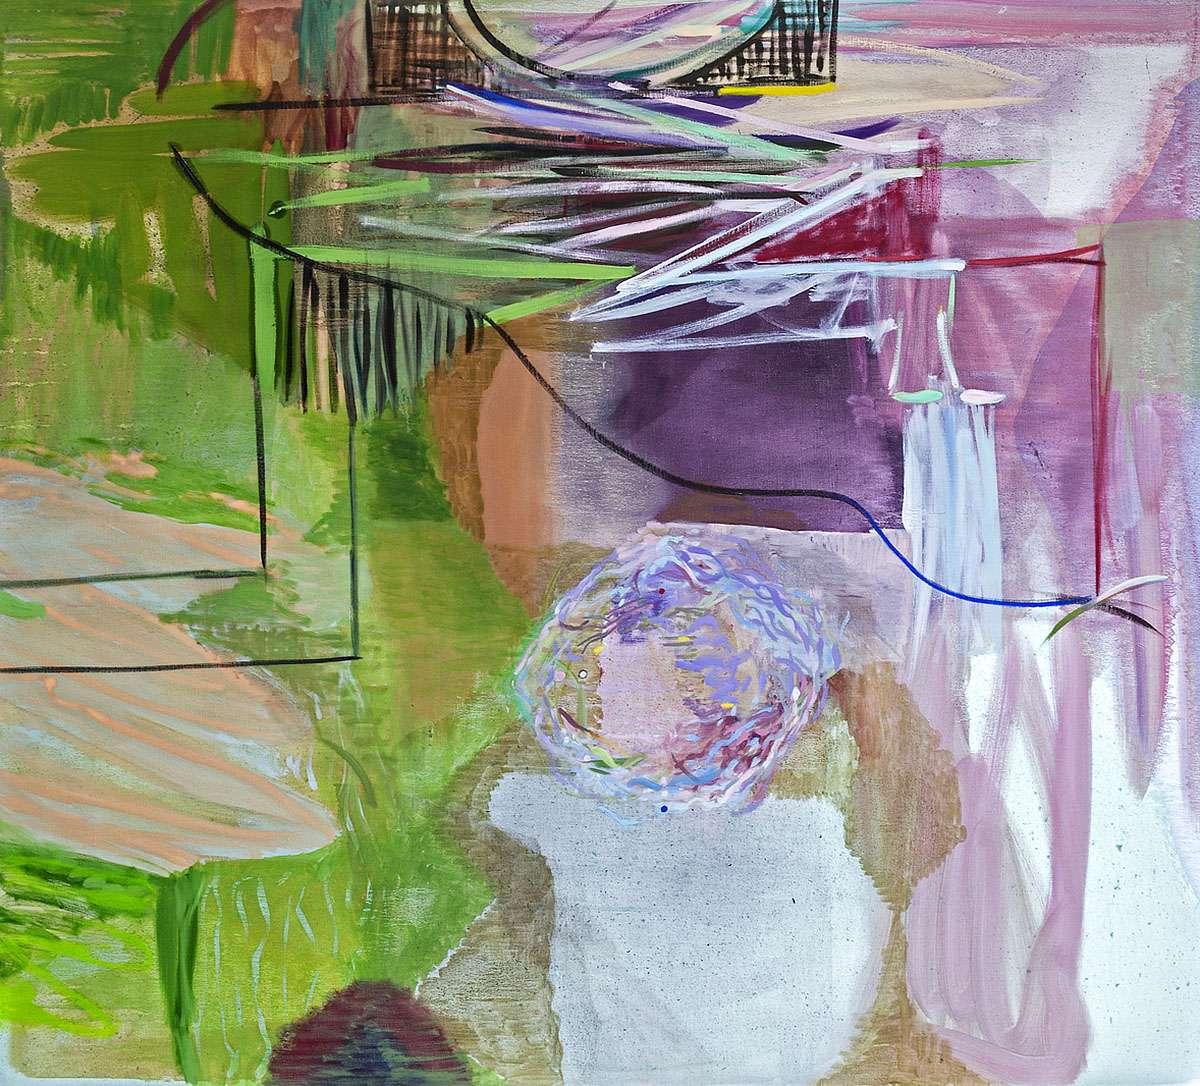 Victoria Morton, 'Bell Rock', oil on linen